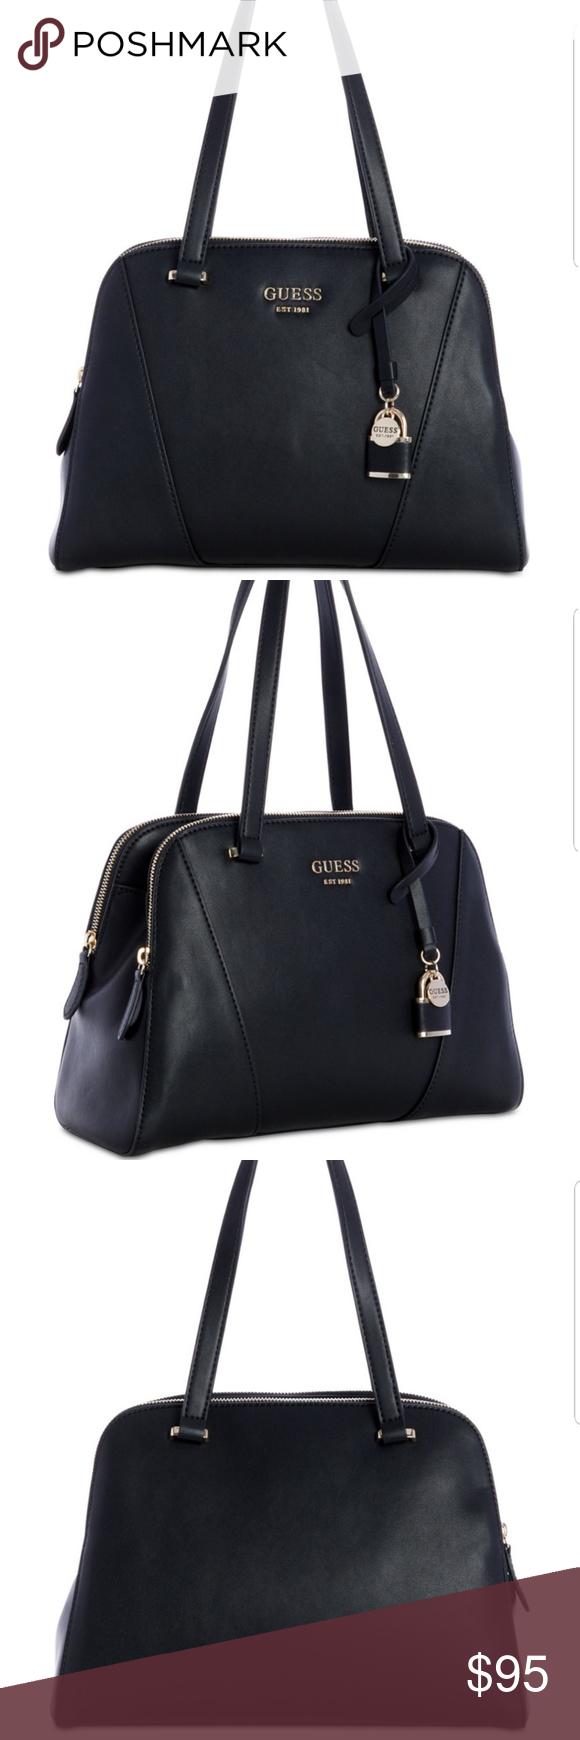 a0573108a2a8 Guess Shawna Cali Shoulder Leather Bag GUESS  Cali Shoulder Bag conceals  multiple compartments in a